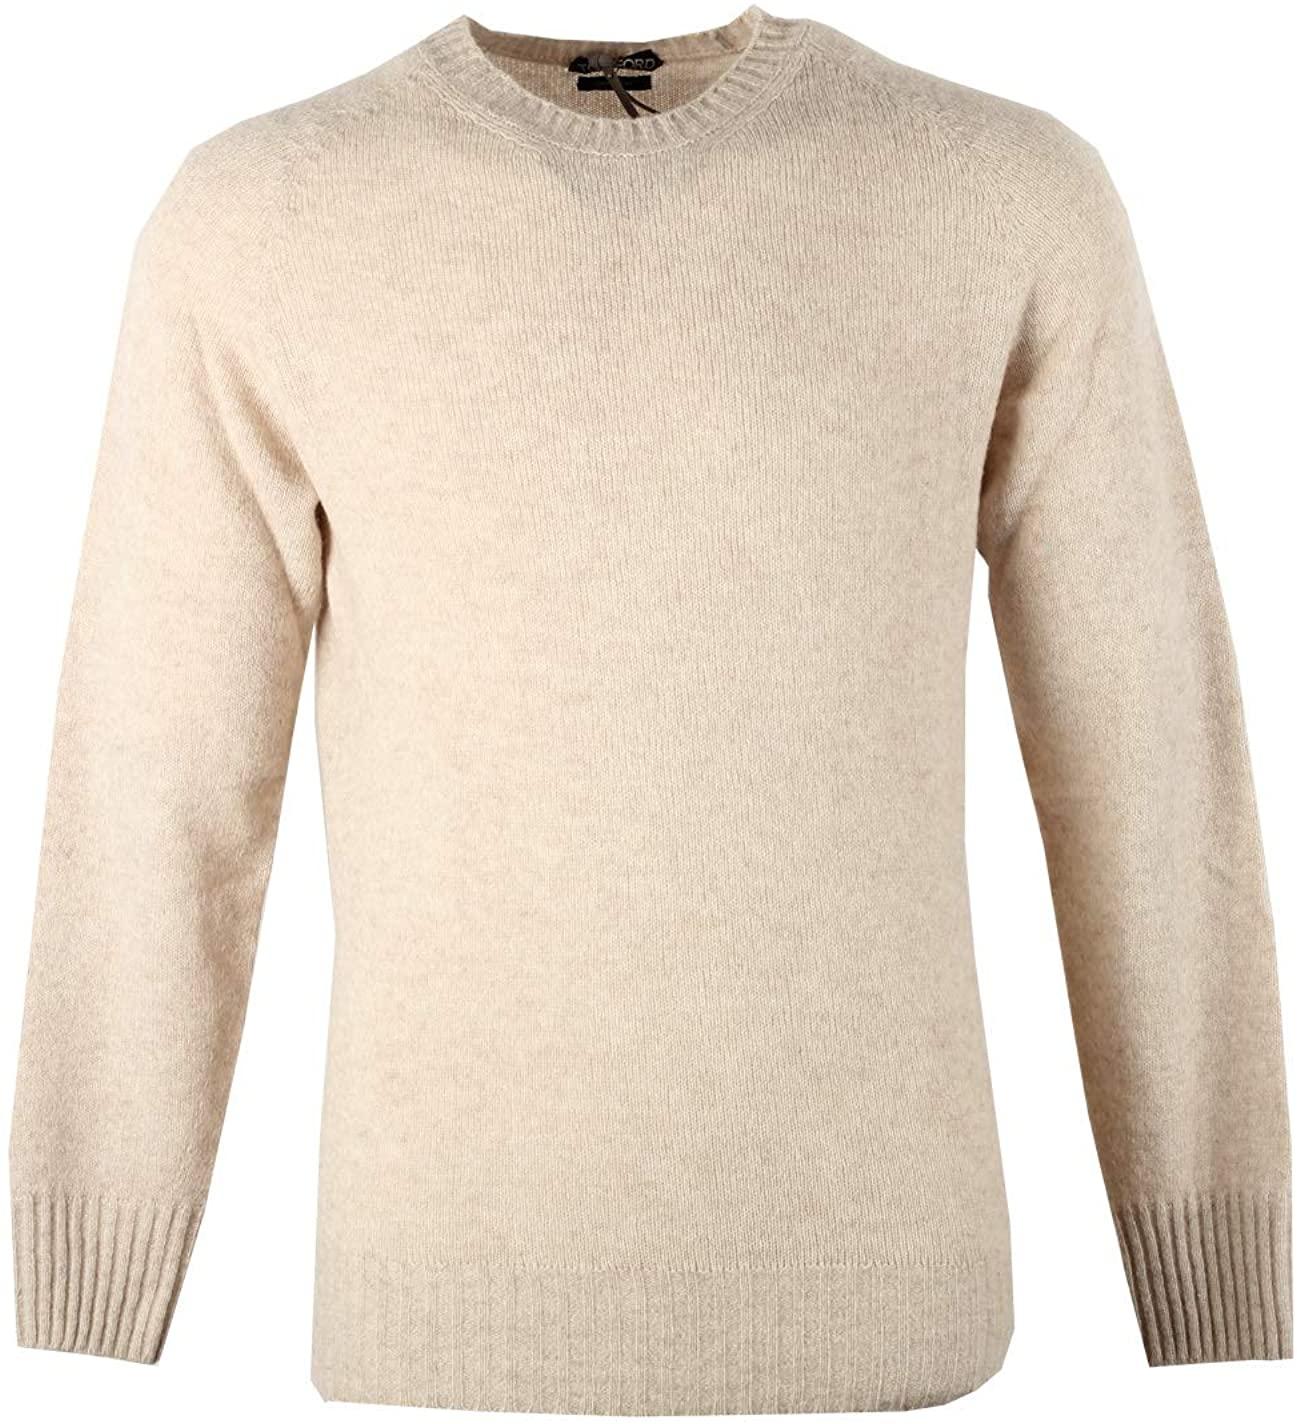 CL - Tom Ford Beige Crew Neck Sweater Size 48 / 38R U.S. in Cashmere Blend